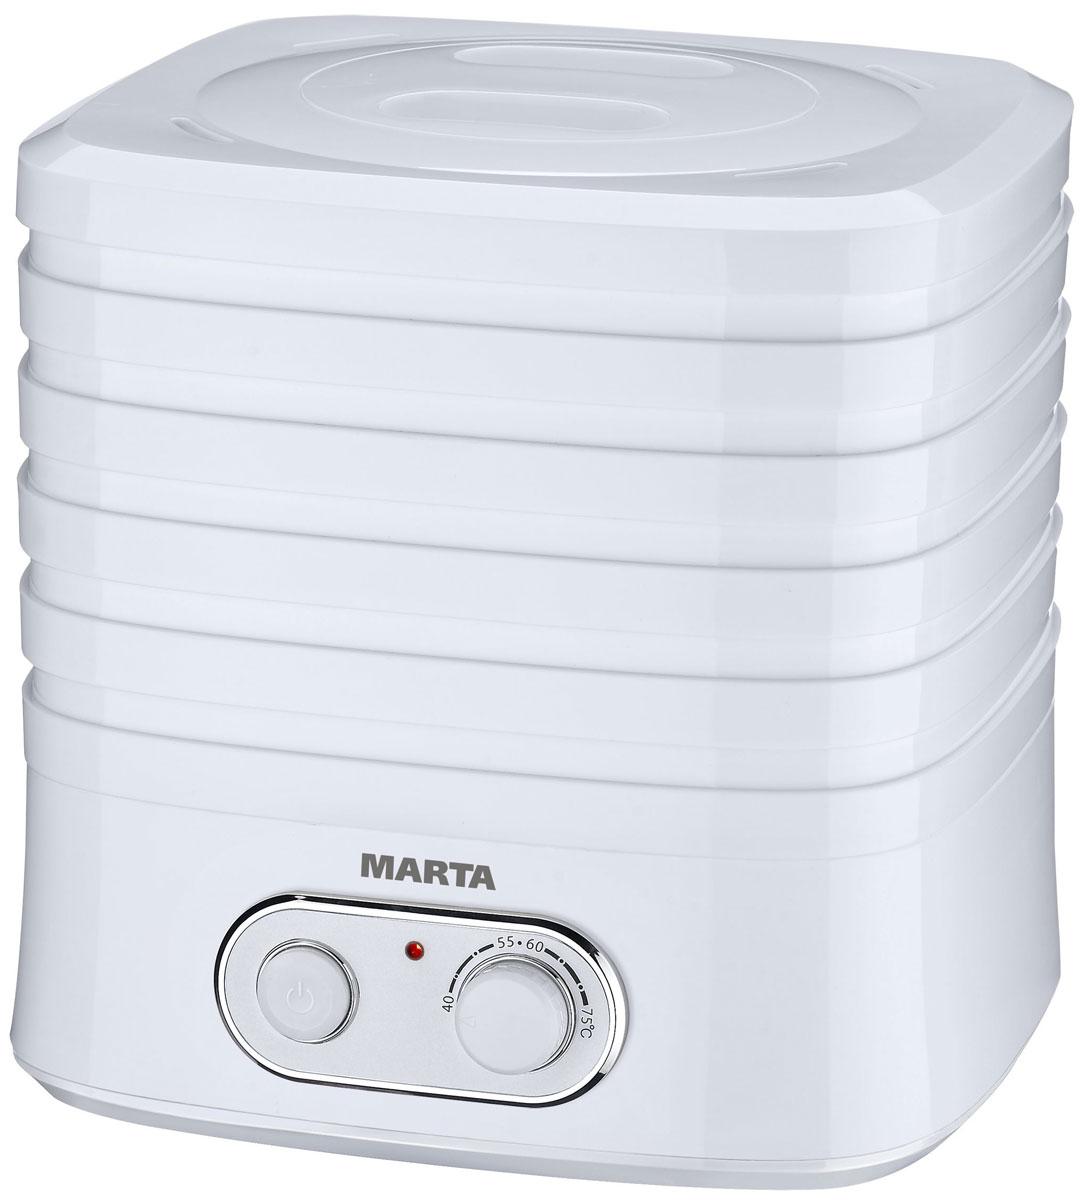 Marta MT-1945 электросушилка для овощей - Техника для хранения, консервации и заготовок